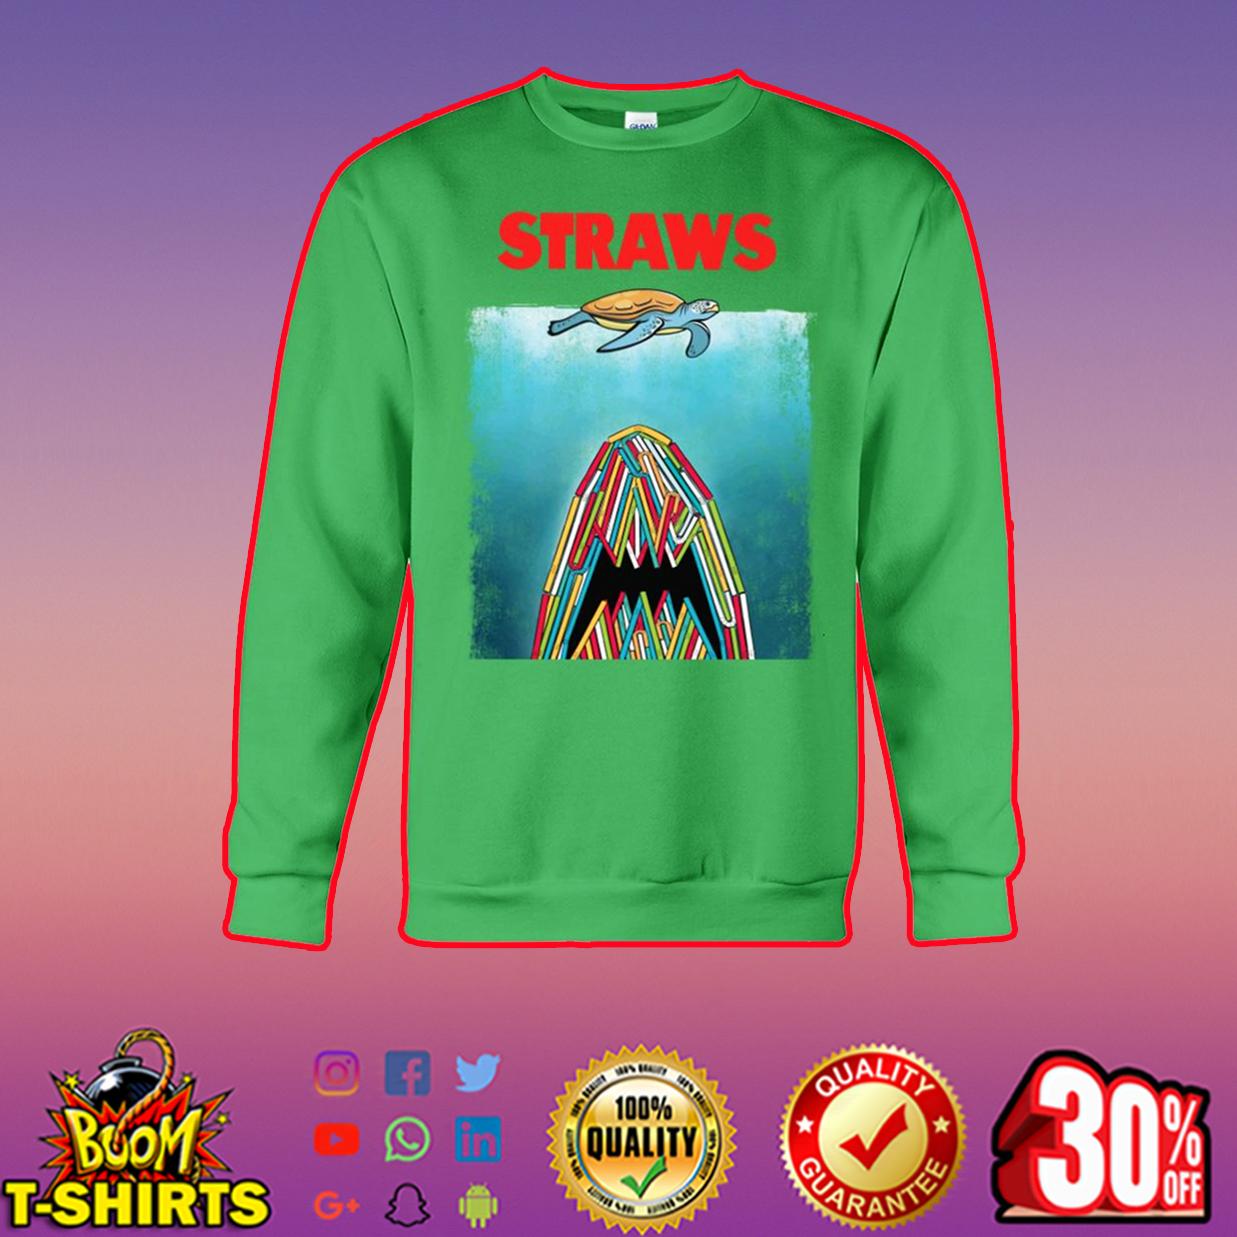 Straws Turtle sweatshirt